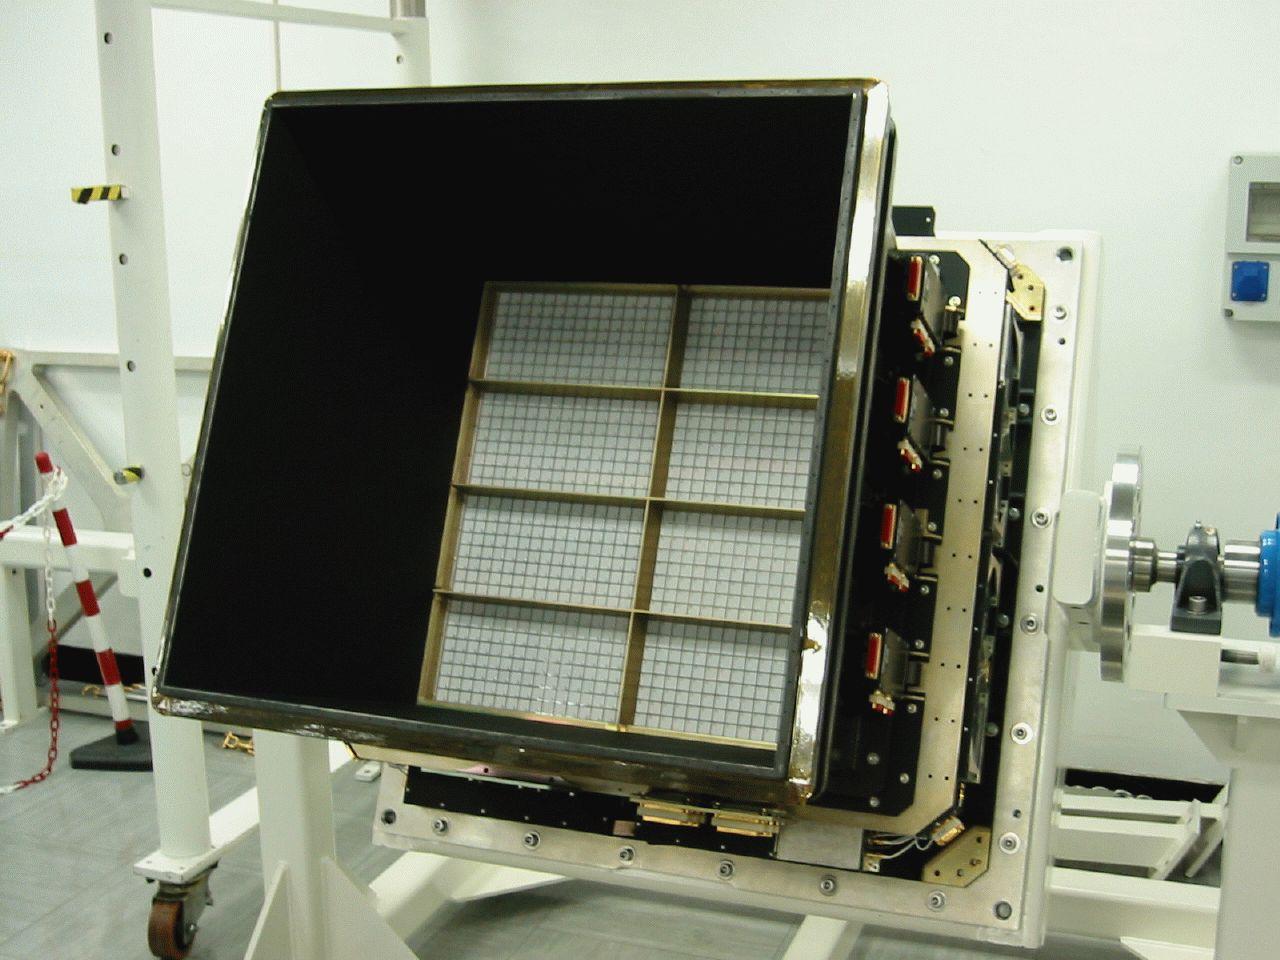 1567219795480-IBIS-detector-unit.jpg